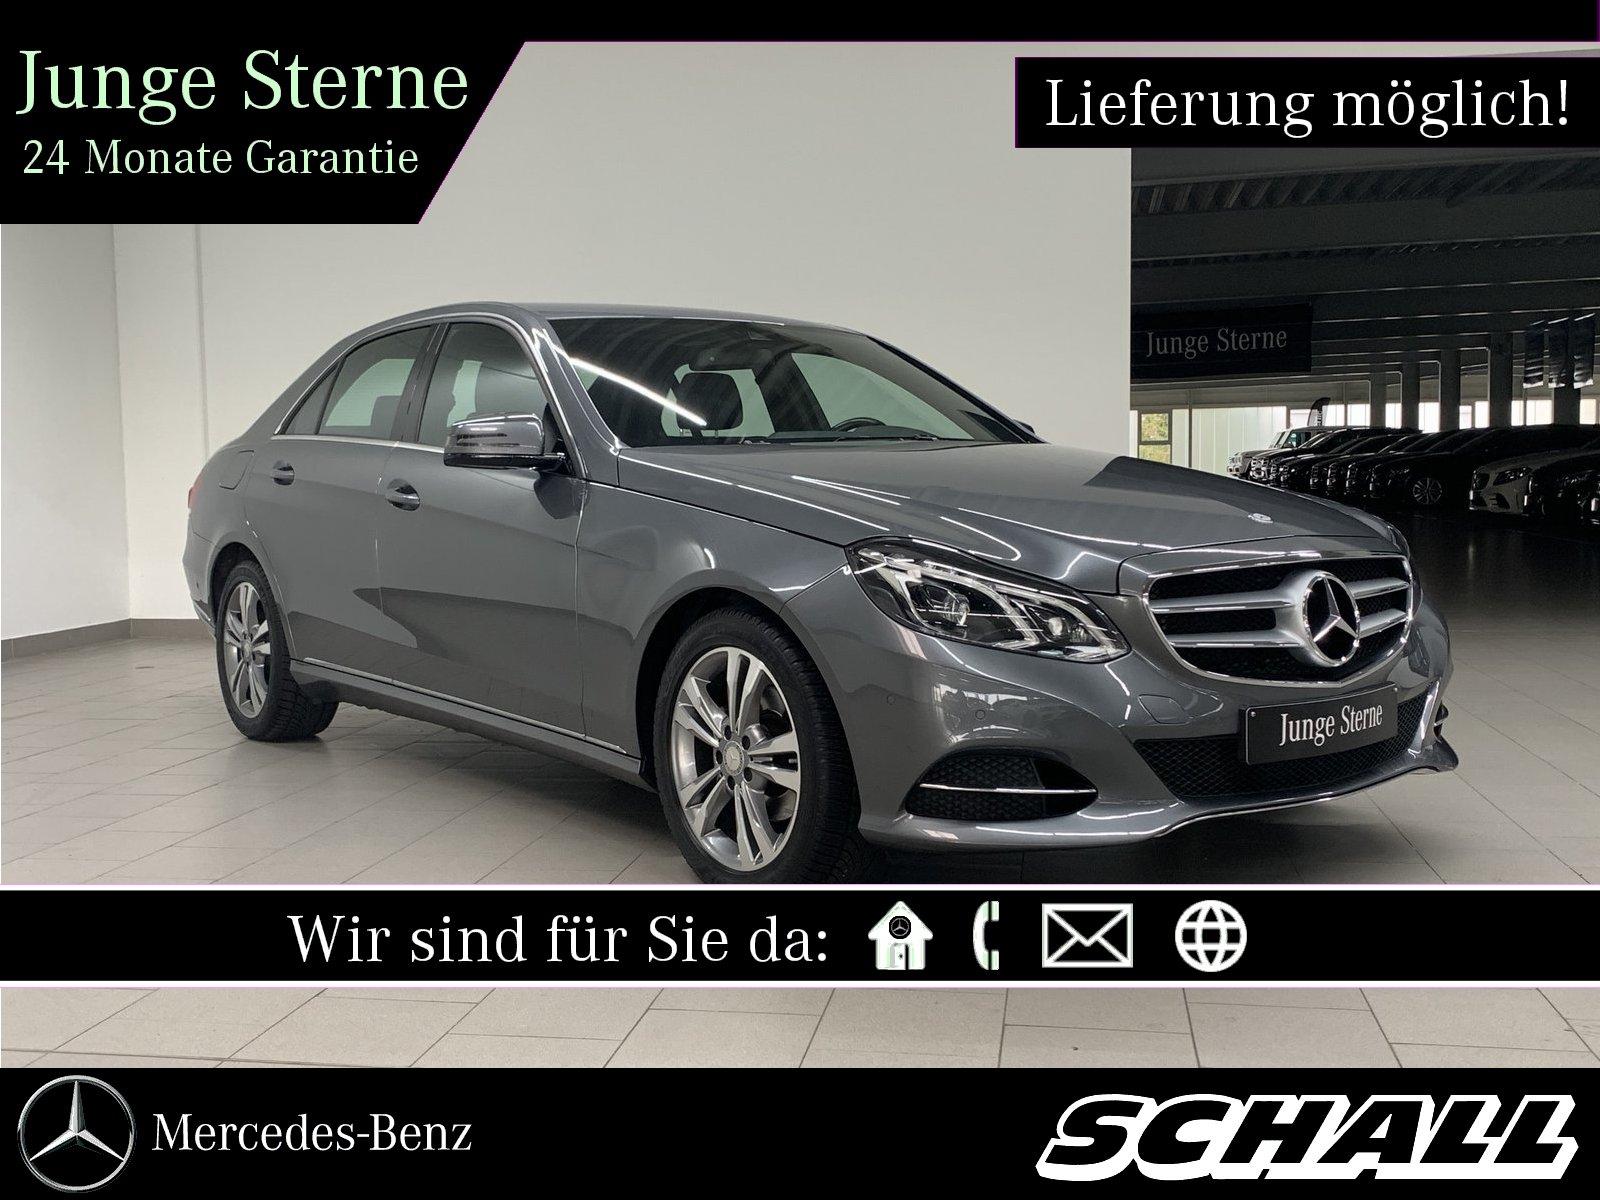 Mercedes-Benz E 200 BT AVANTGARDE+LED INTELLIGENT+NAVI+PARKTRO, Jahr 2015, Diesel